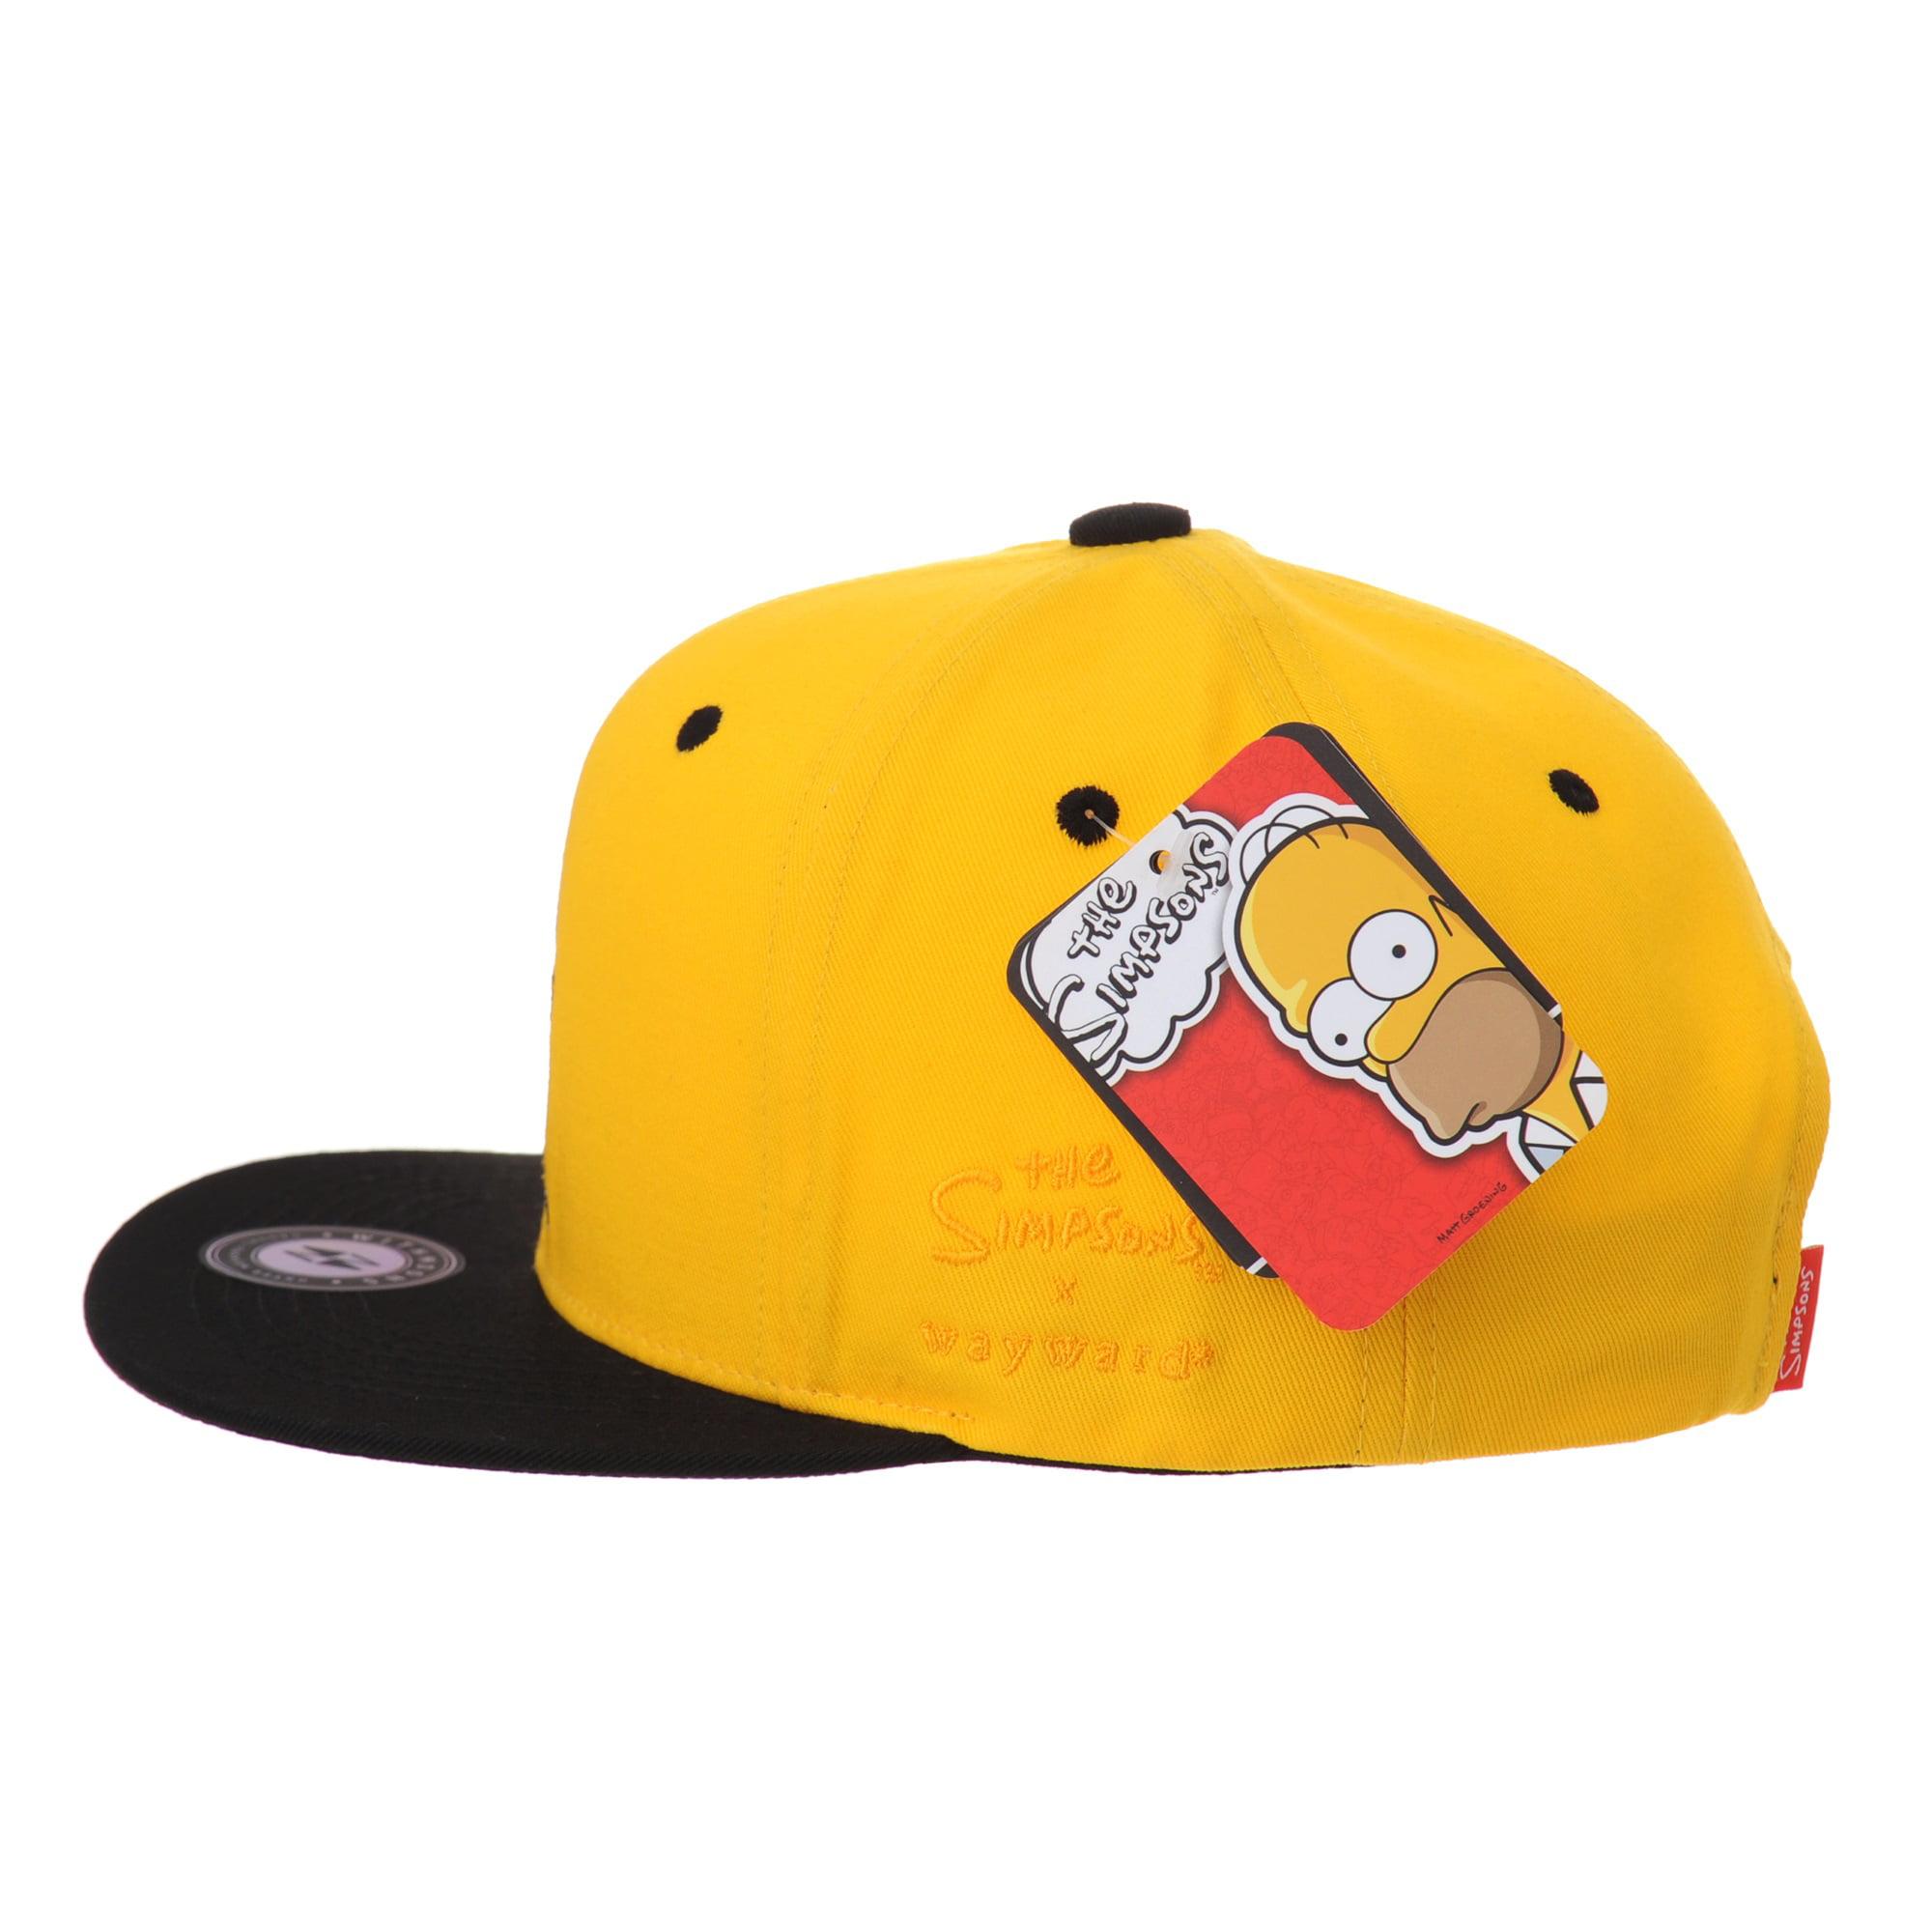 WITHMOONS The Simpsons Baseball Cap Superman Snapback Hat HL2657 (White) -  Walmart.com 7d6aeb286442